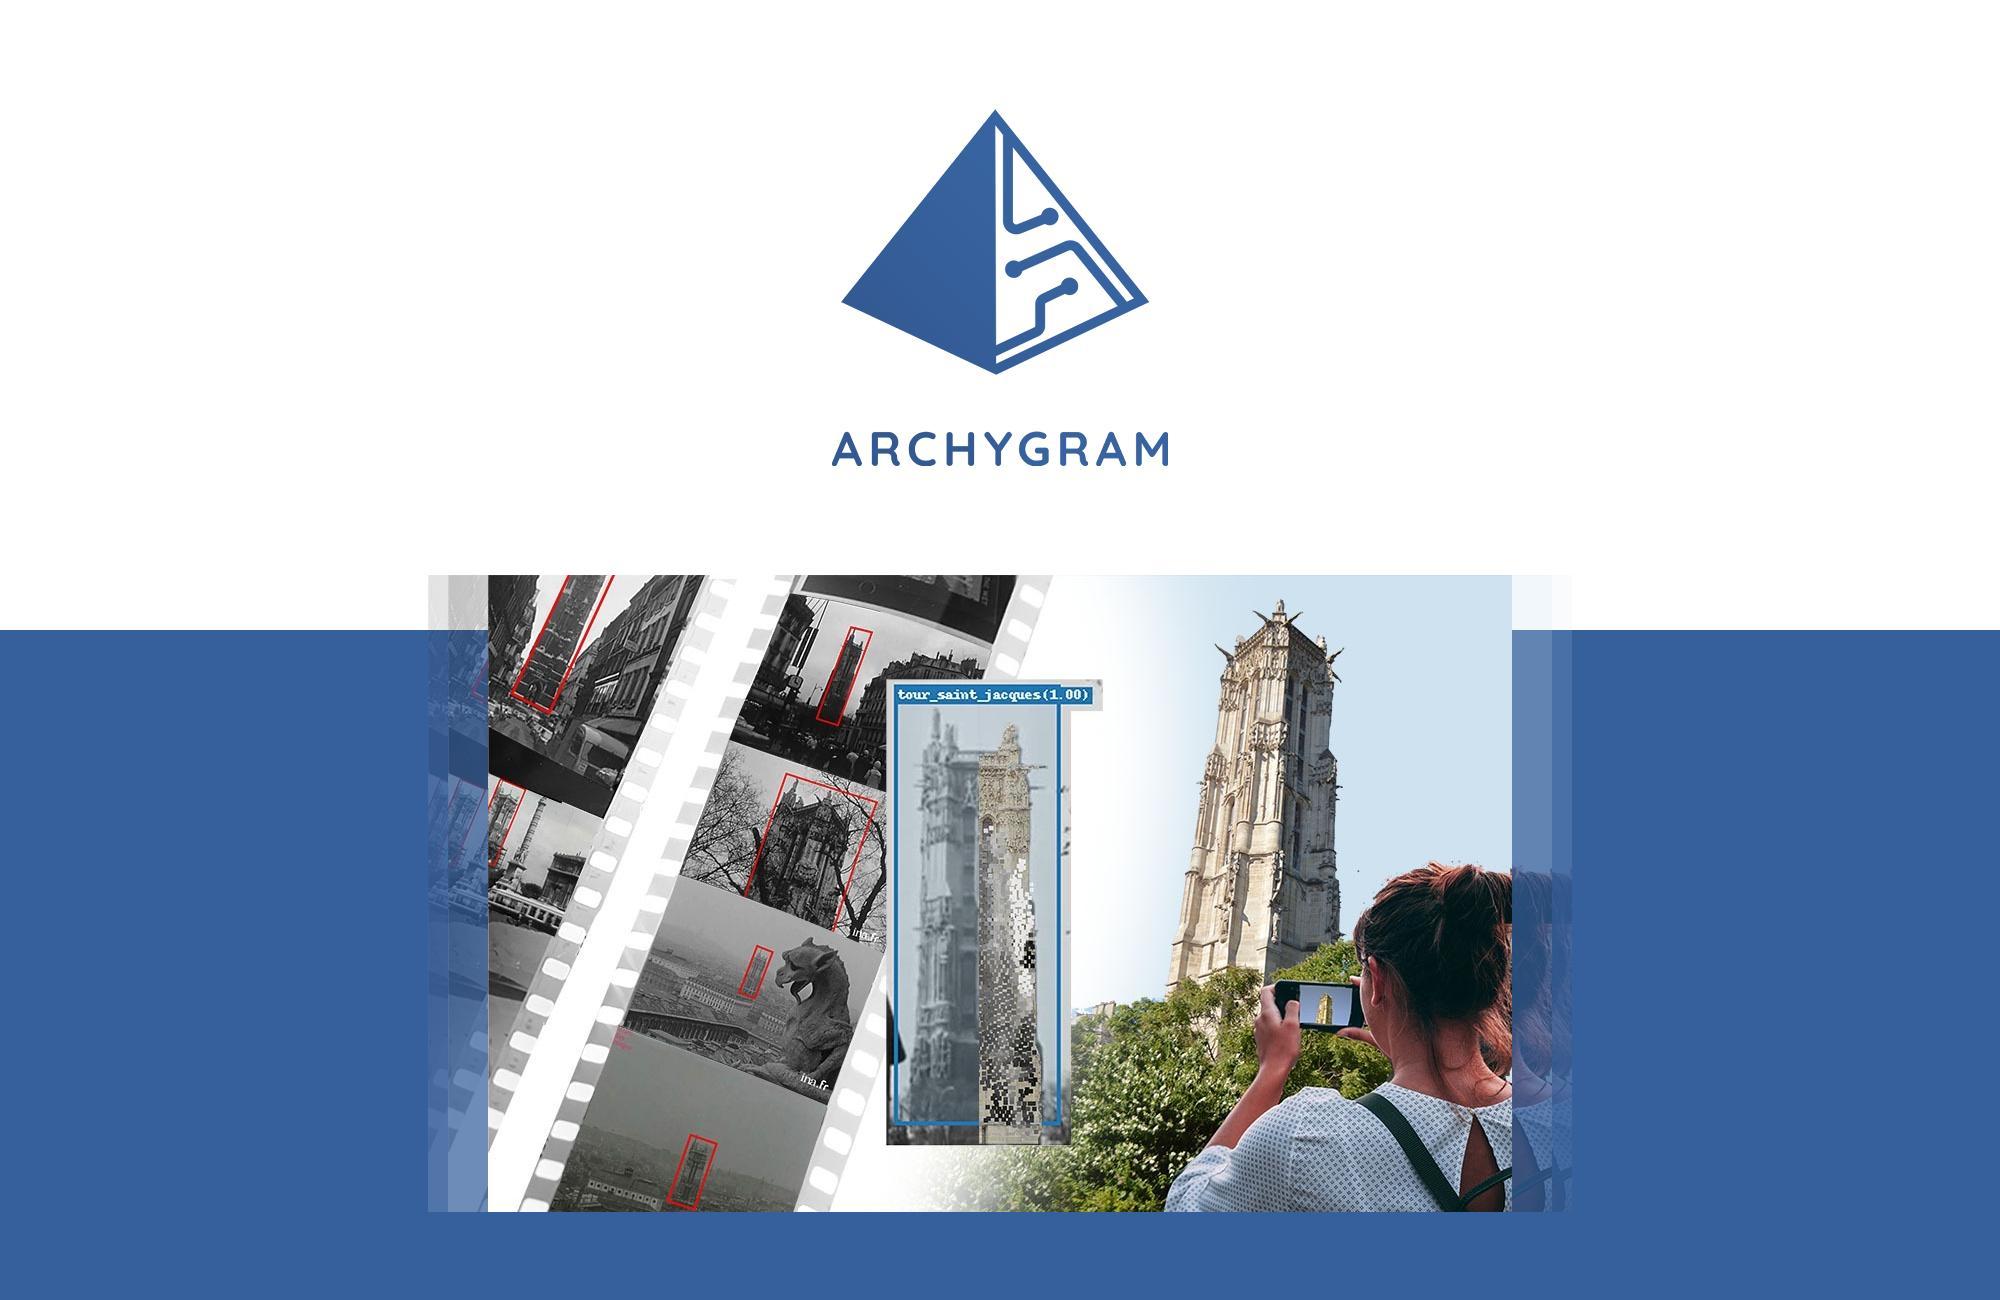 Archygram